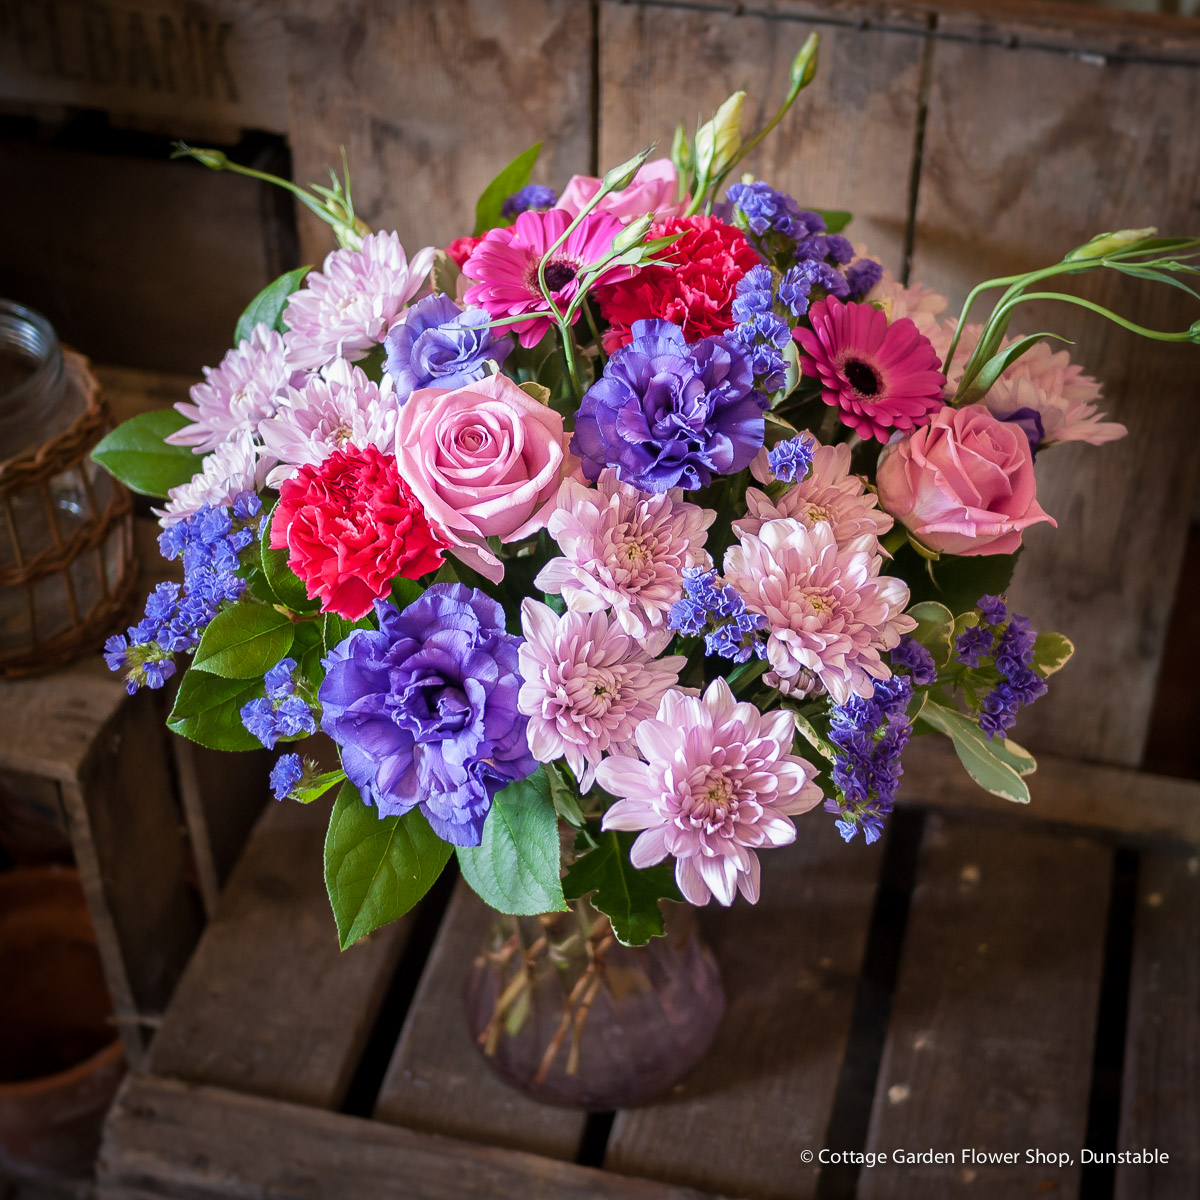 Pinks Purple Vase The Cottage Garden Flower Shop Dunstables